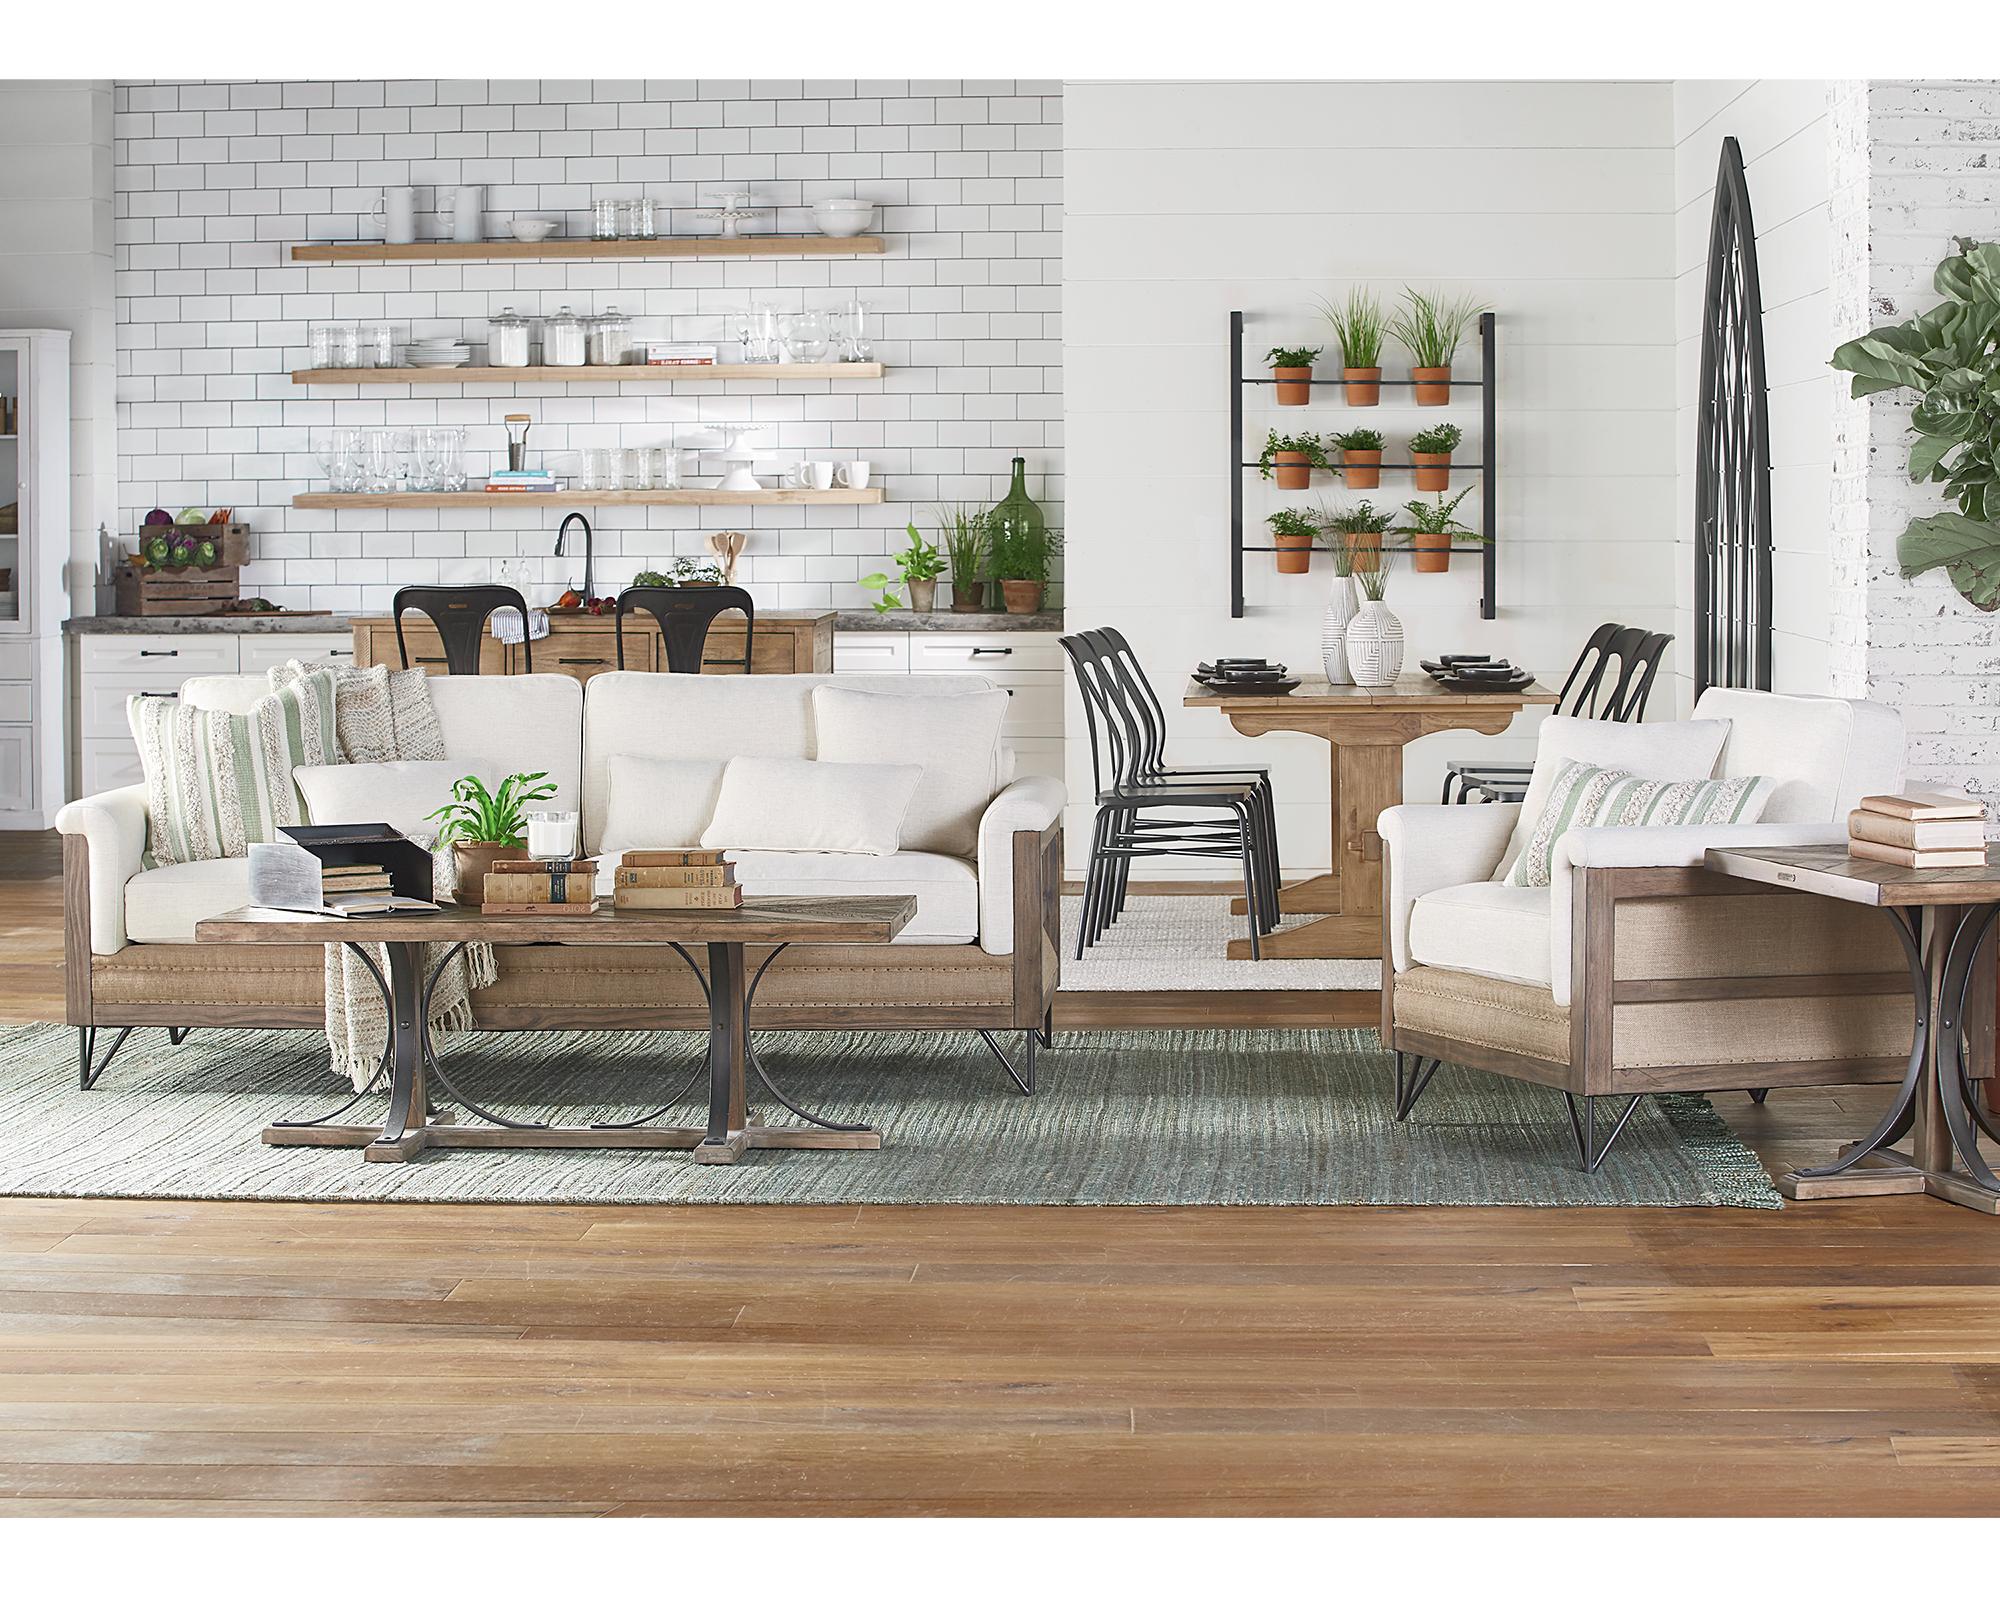 Trendy Iron Trestle Coffee Table Magnolia Home With Magnolia Home Iron Trestle Cocktail Tables (Gallery 6 of 20)